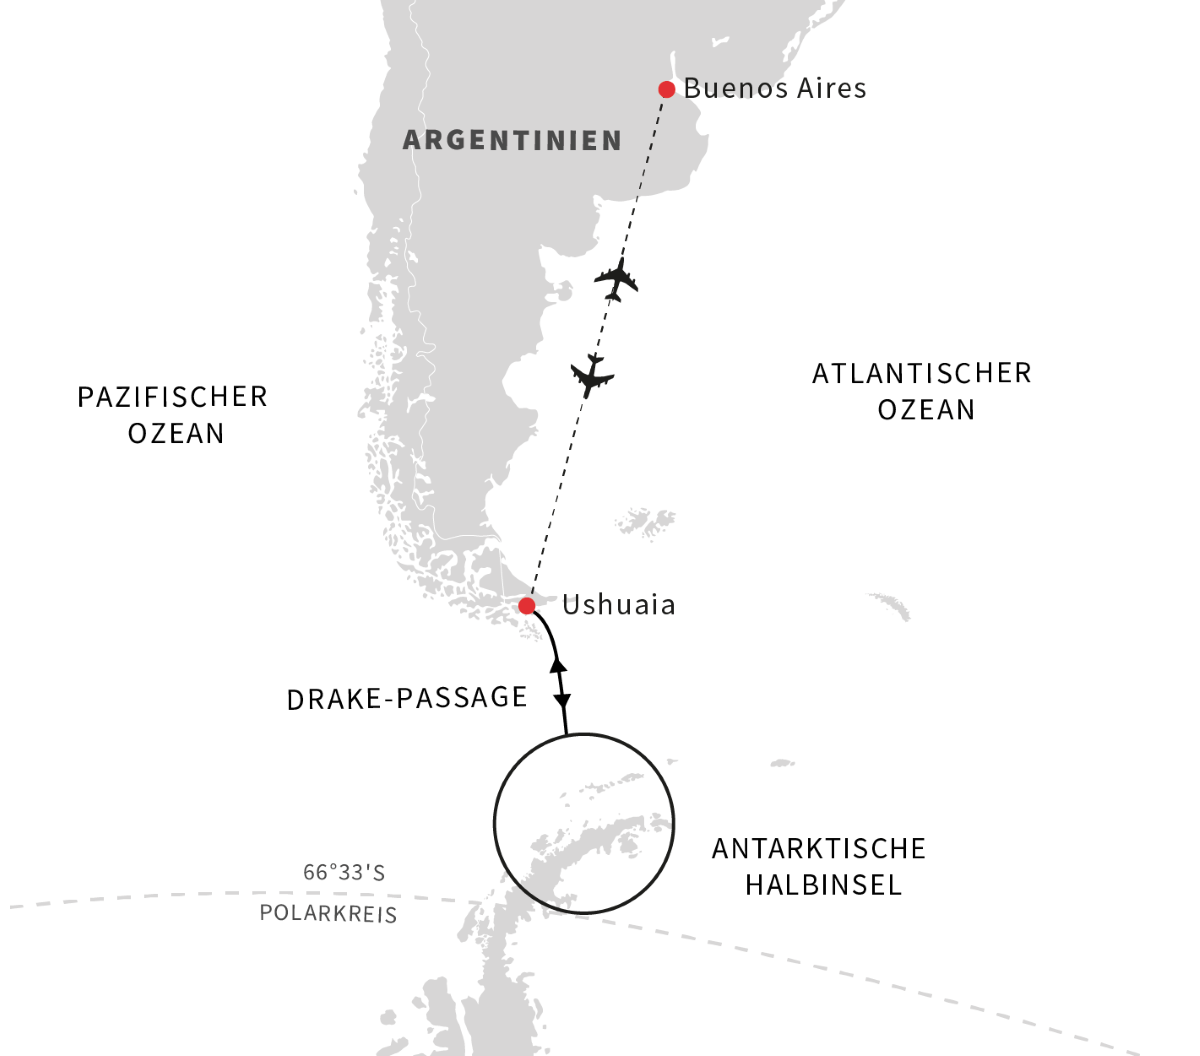 Hurtigruten Antarktis: Route Expedition 2022